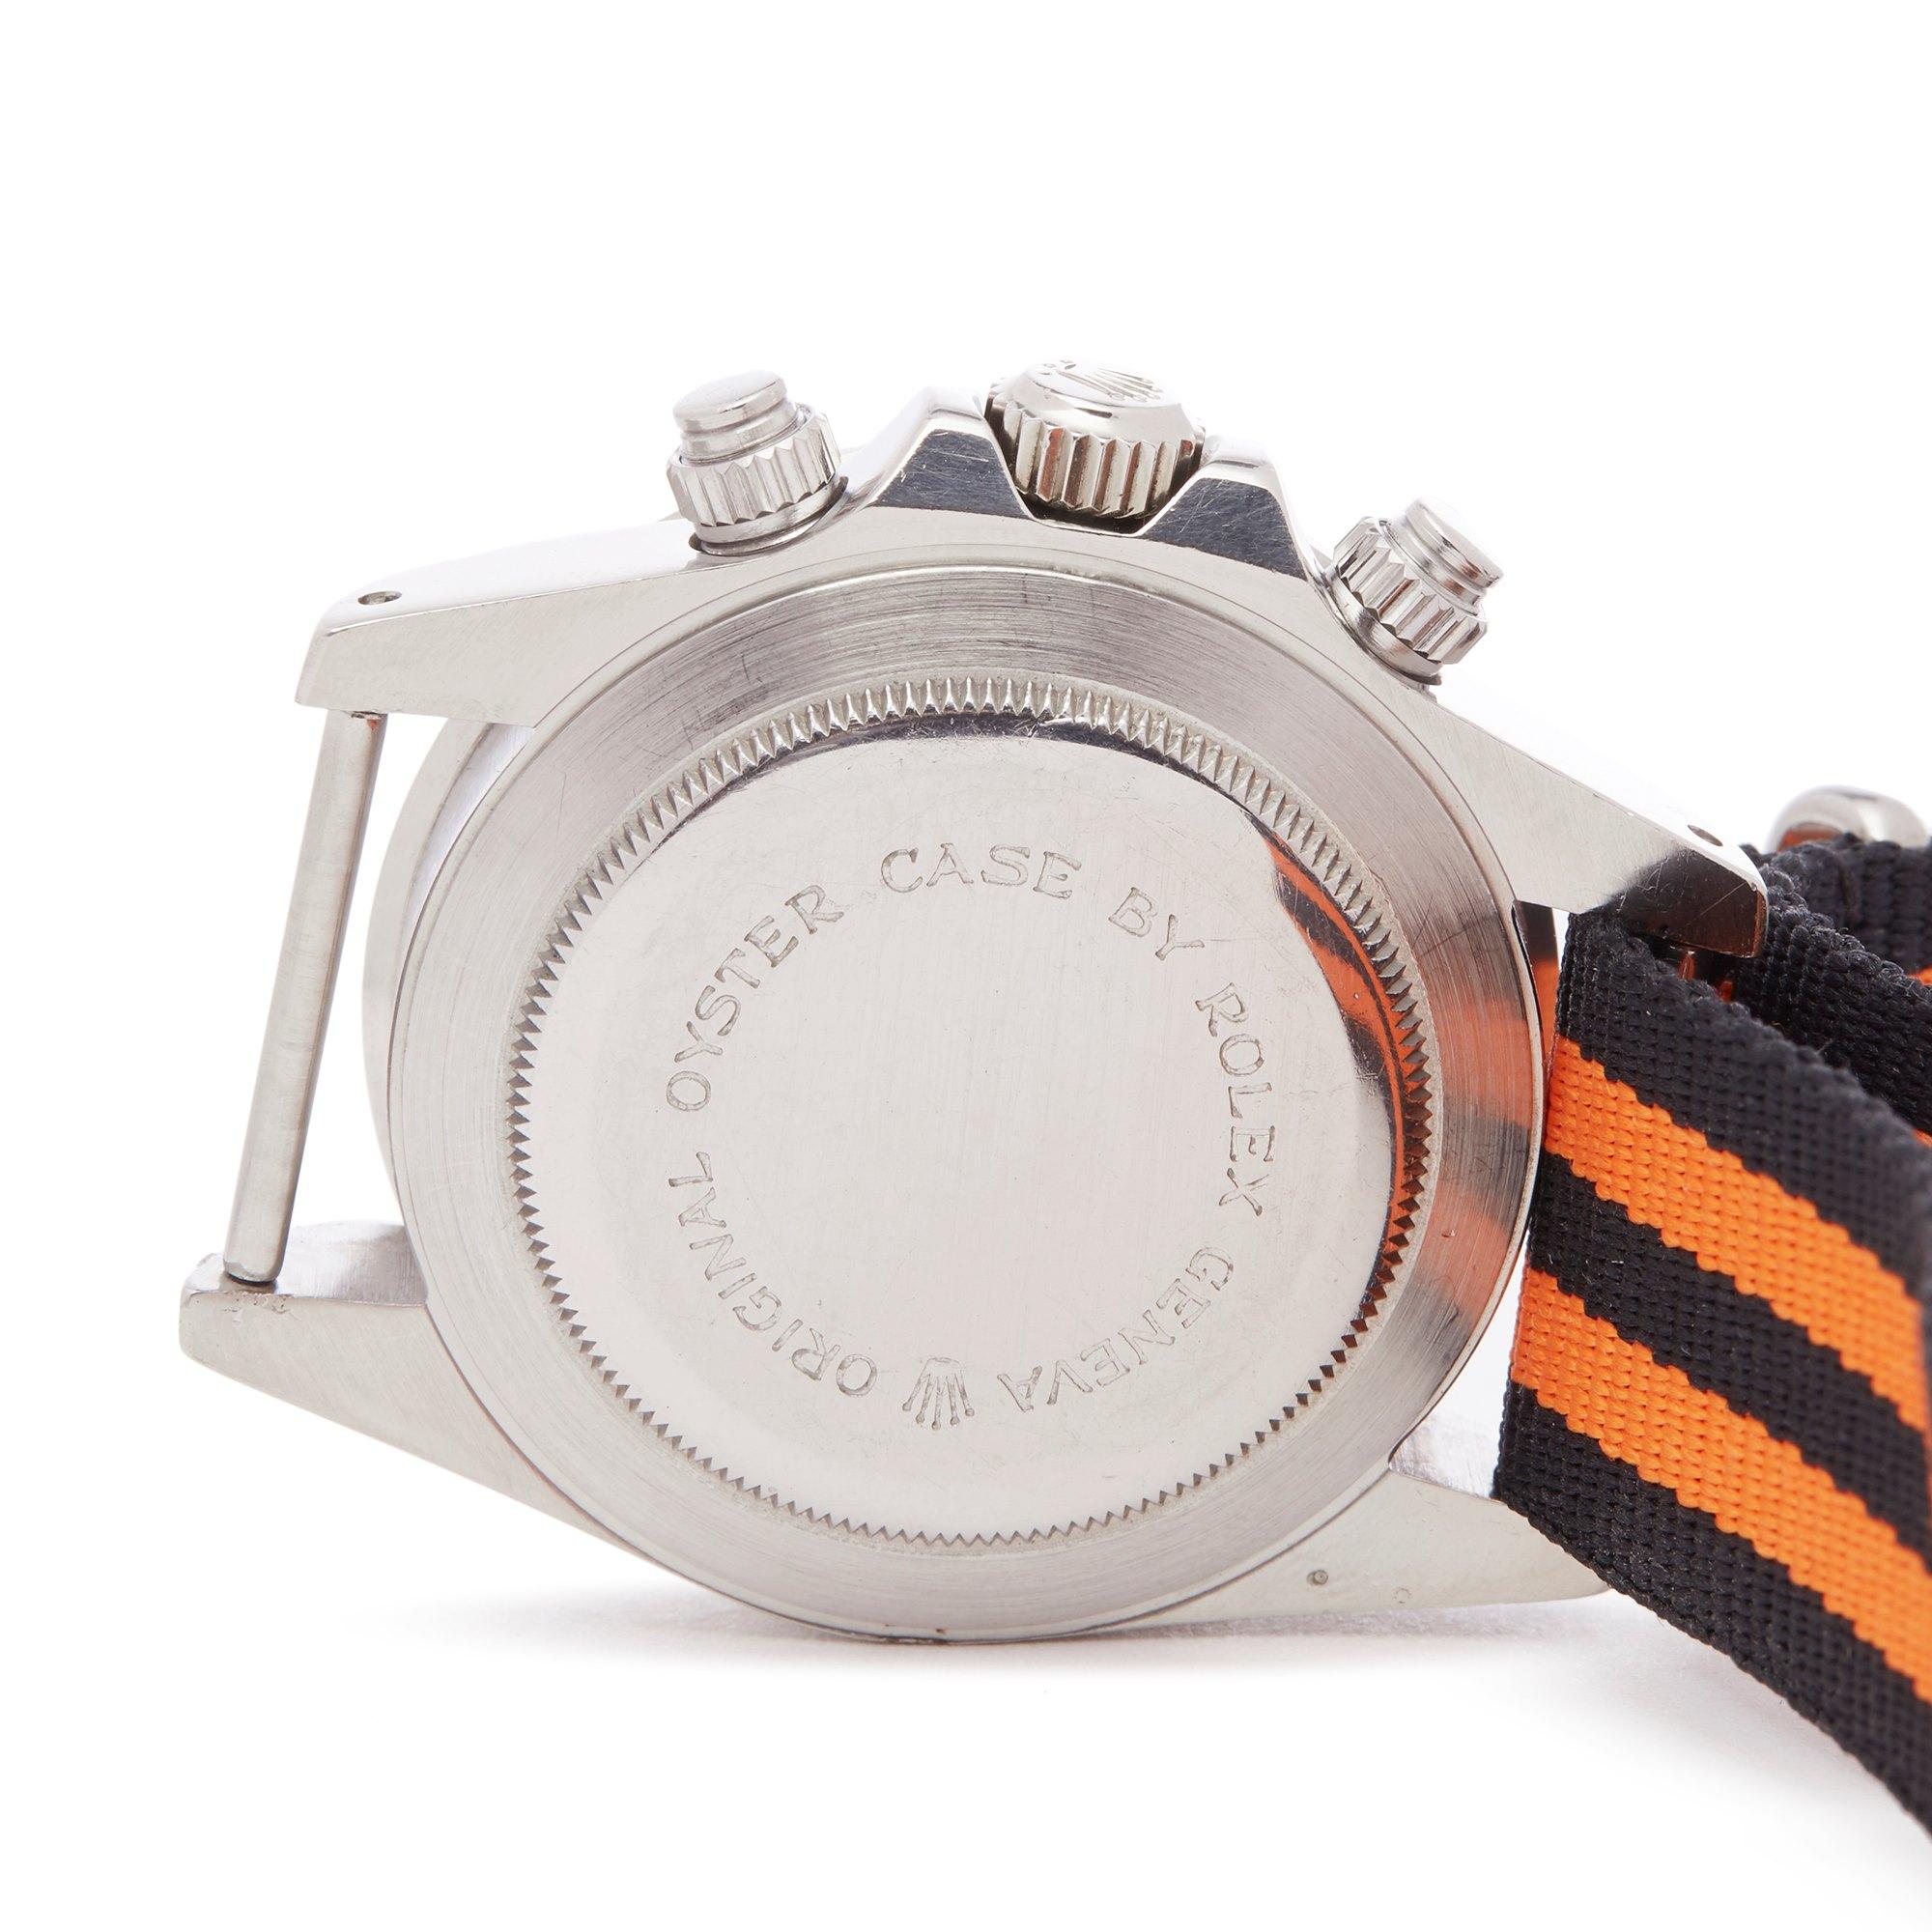 Tudor Oysterdate Chronograph Stainless Steel 94200